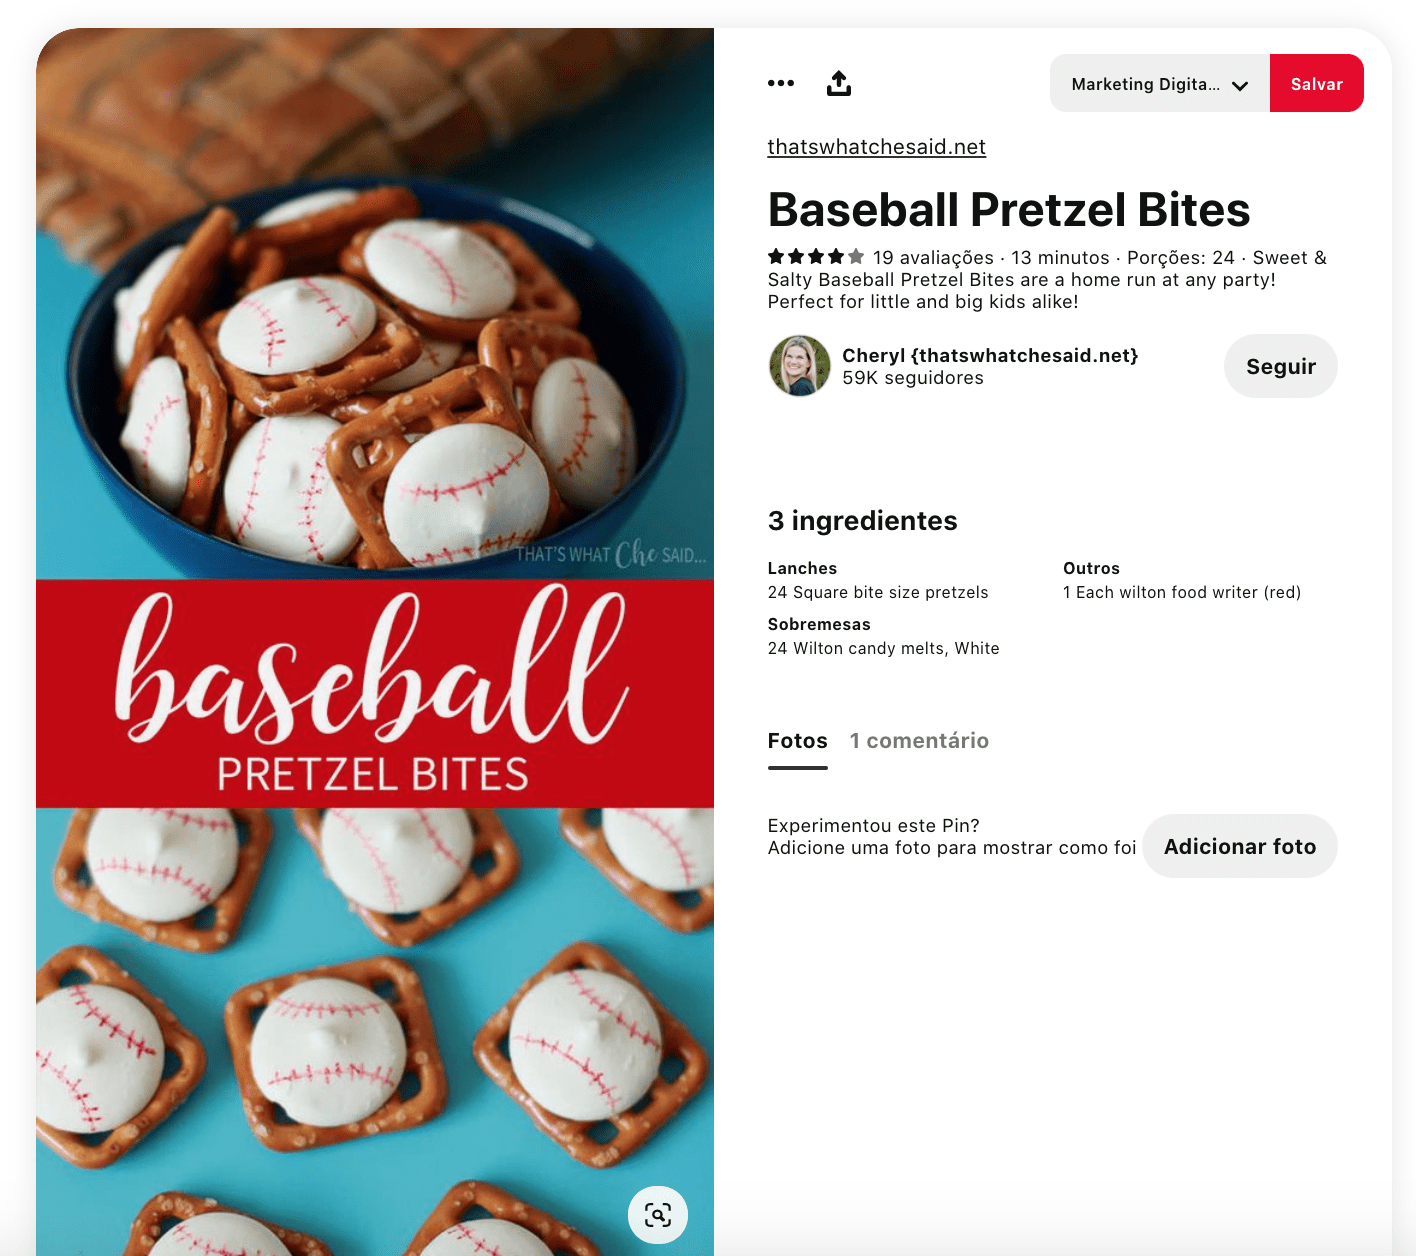 baseball marketing ideas tutorial recipe